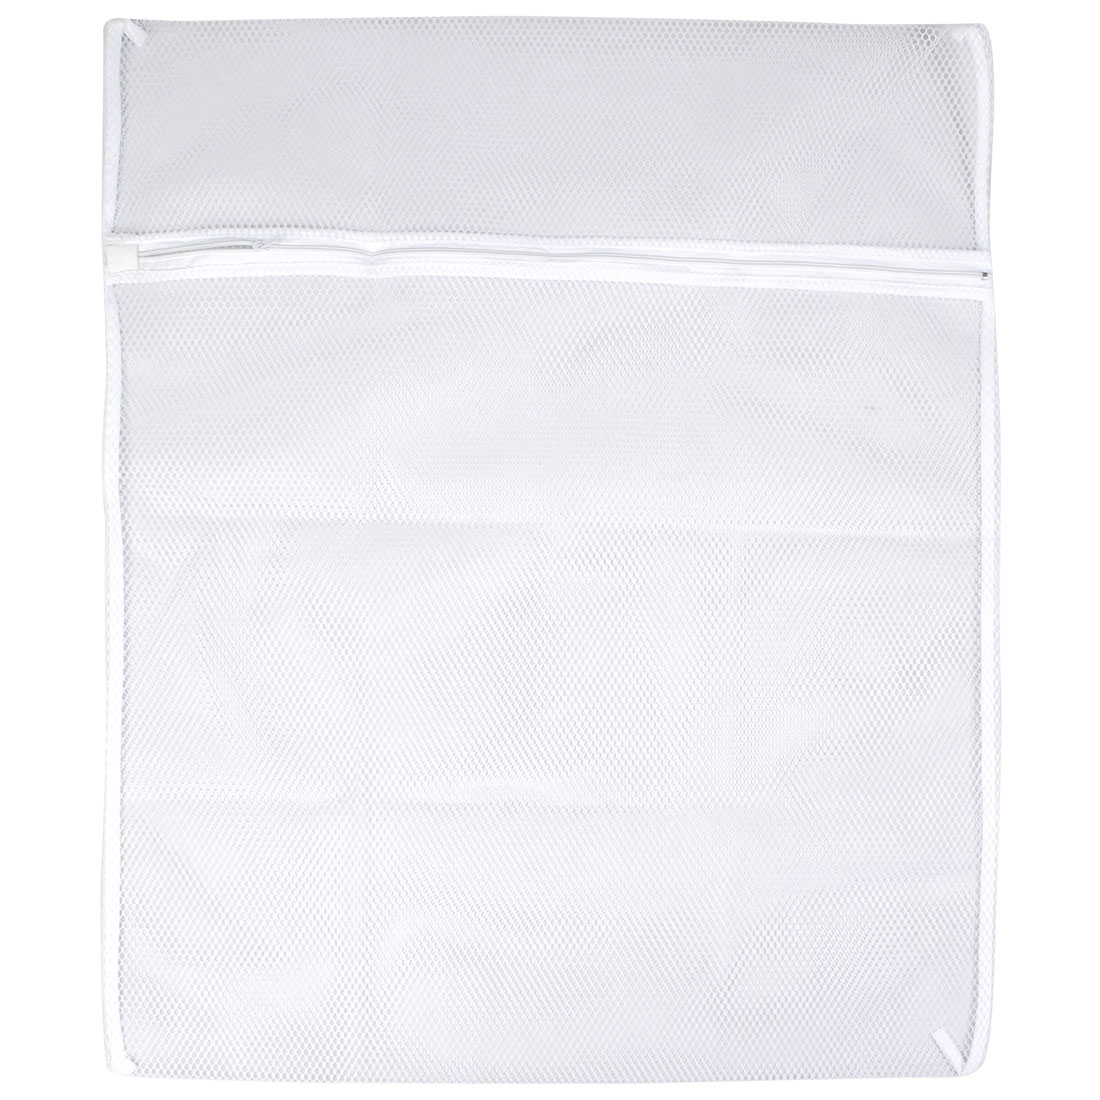 Zipper Closure White Nylon Mesh Lingerie Clothes Wash Washing Bag 68cm x 57cm